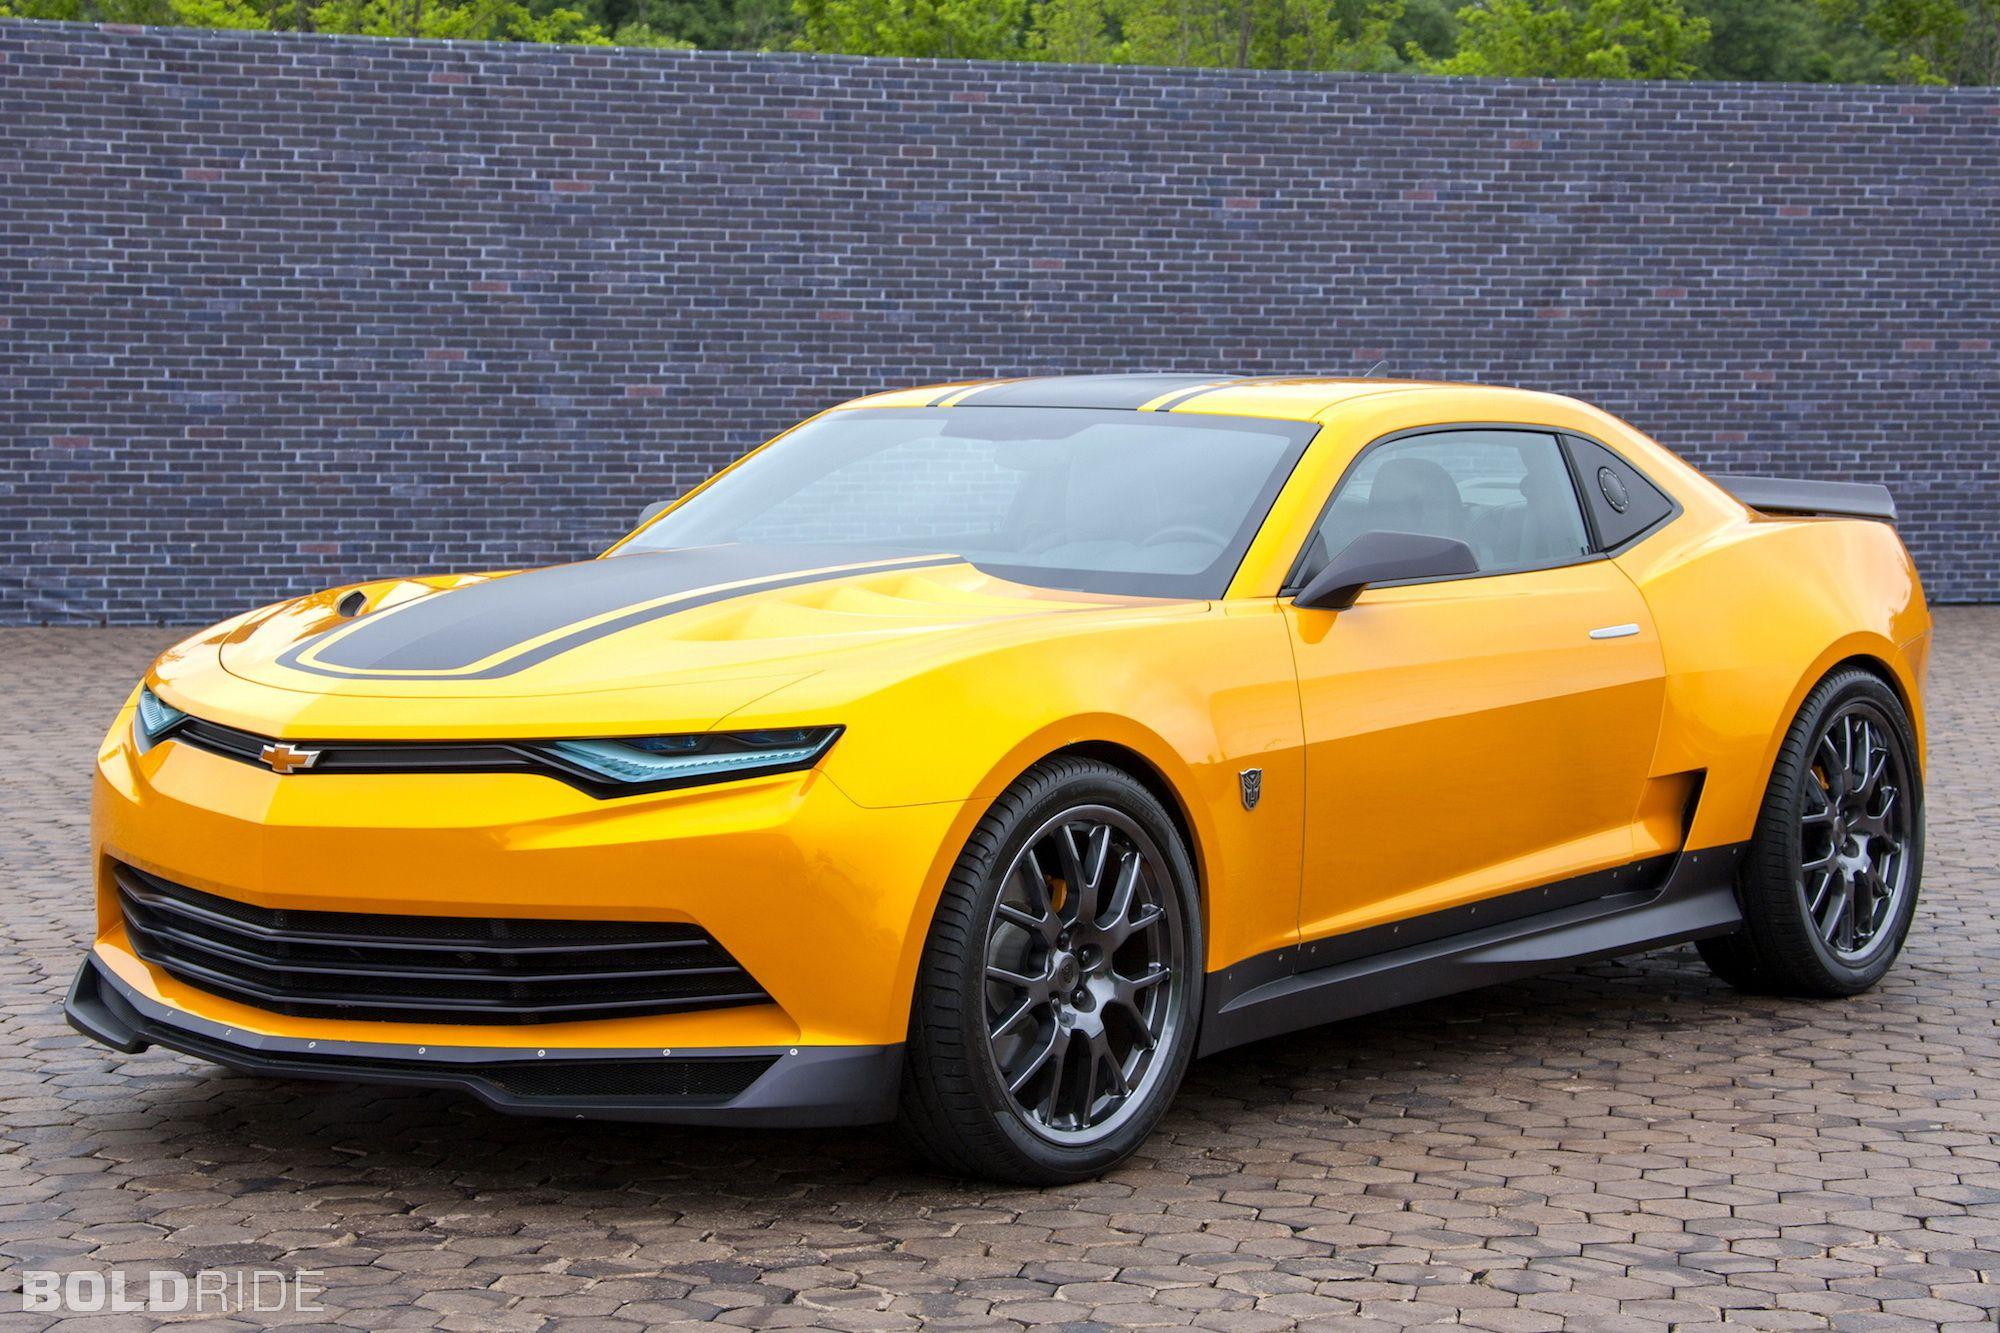 Chevrolet Camaro Bumblebee Concept 2000x1333 Jul 03 2014 16 23 20 564938 Jpg 2000 1333 Camaro Chevrolet Camaro Chevrolet Camaro Bumblebee